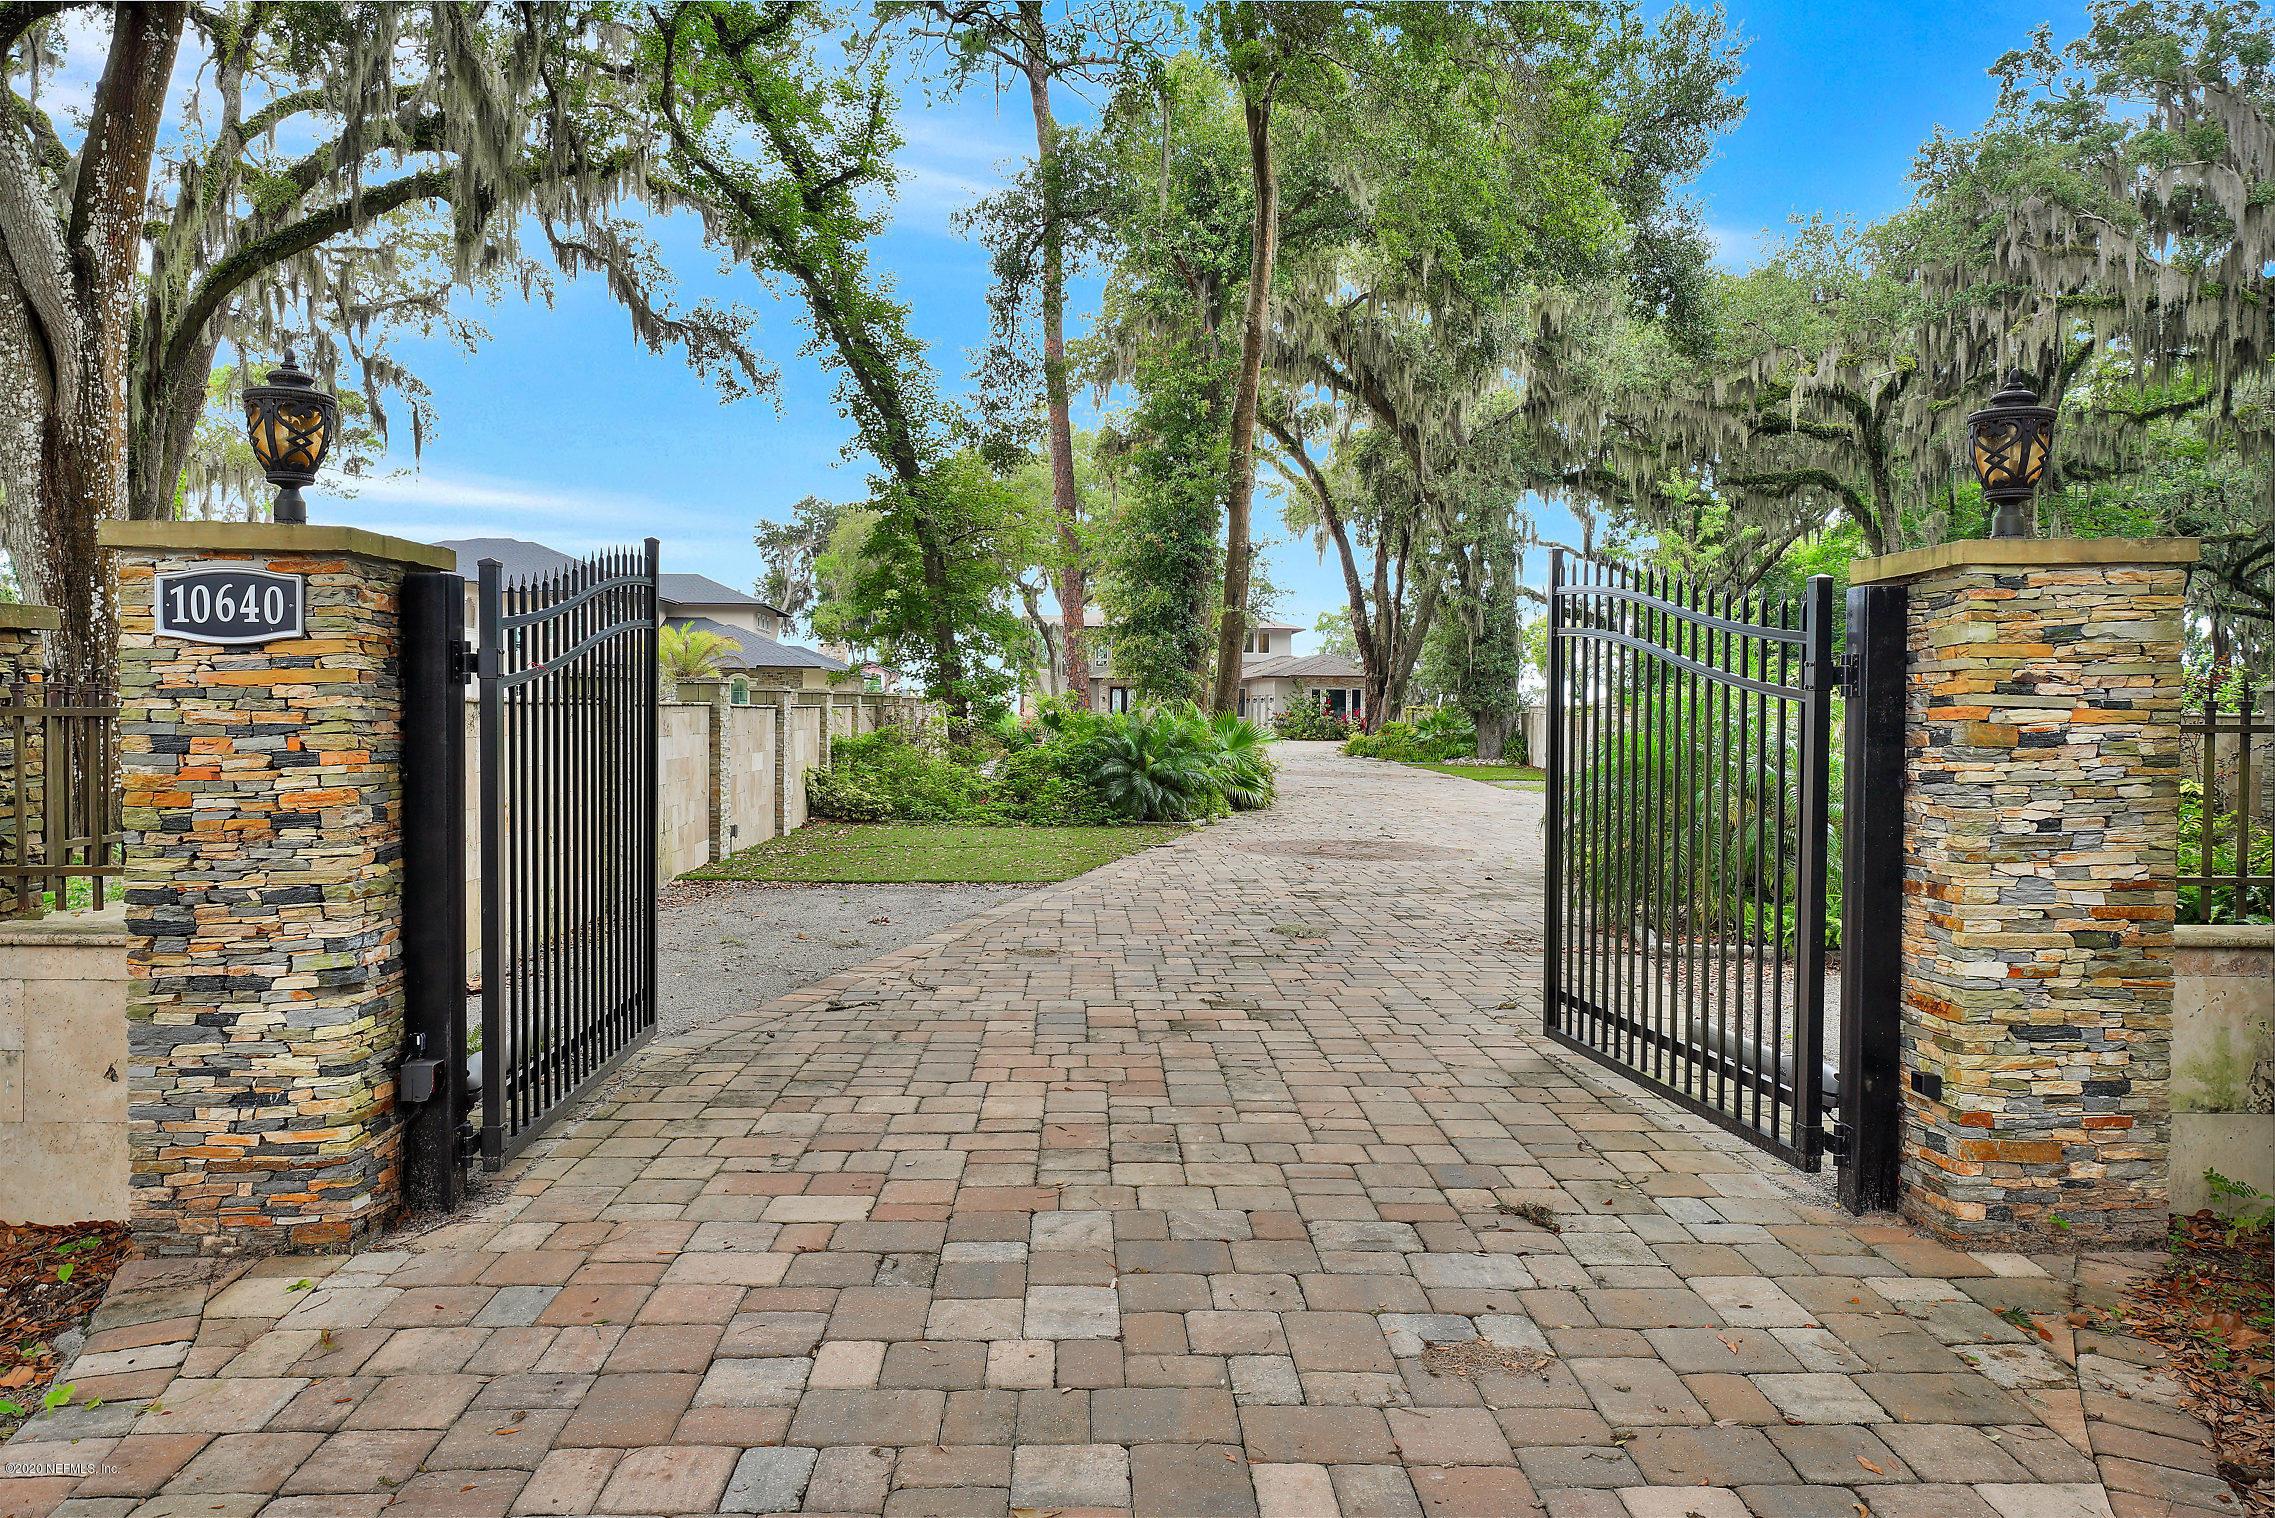 10640 SCOTT MILL, JACKSONVILLE, FLORIDA 32223, 4 Bedrooms Bedrooms, ,4 BathroomsBathrooms,Residential,For sale,SCOTT MILL,1058309